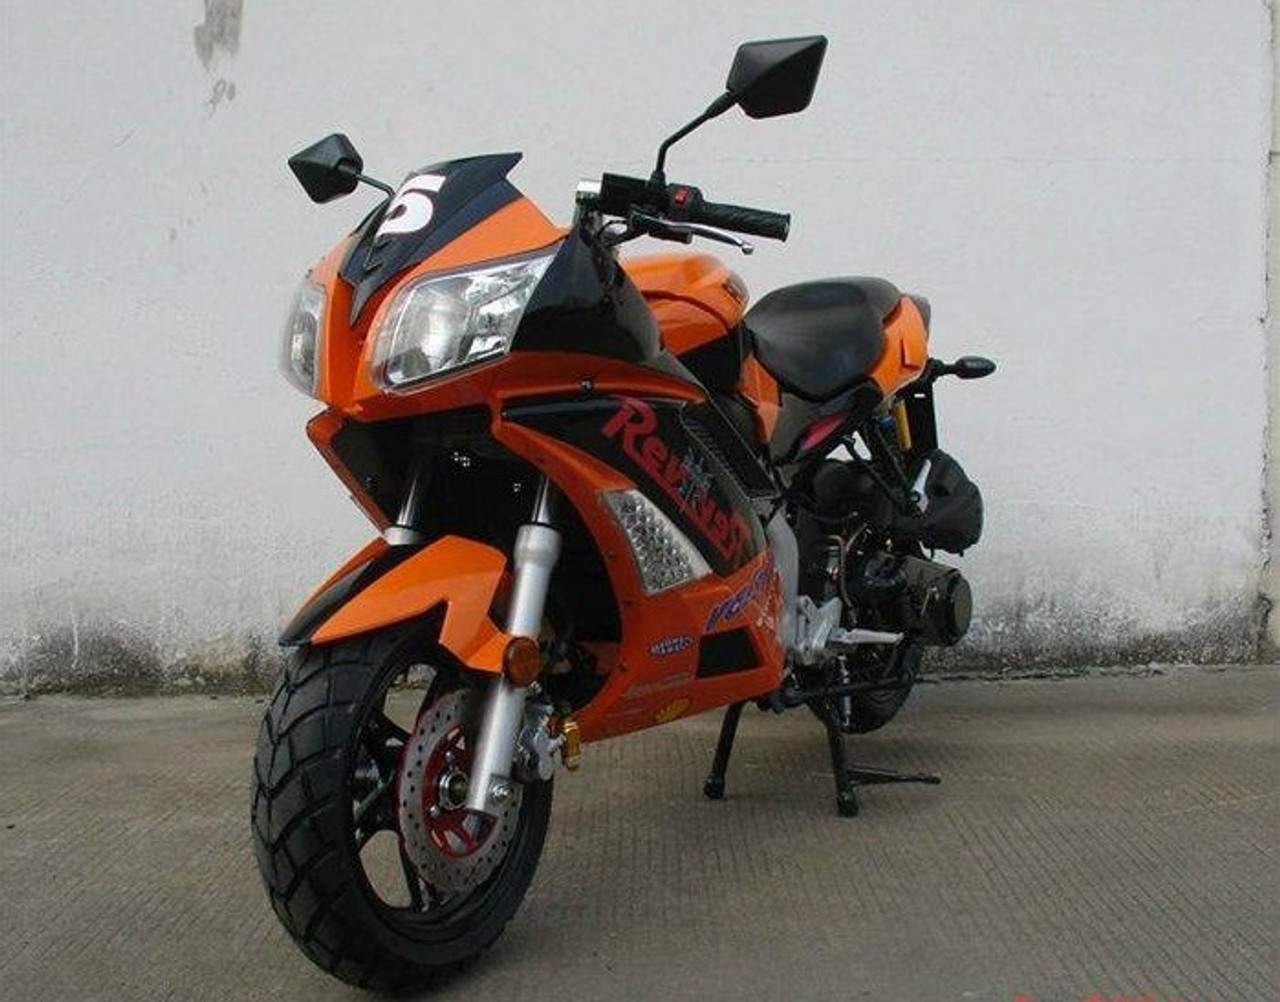 MC-06 Fully Assembled Fully Automatic Street Legal 150cc Sports Bike